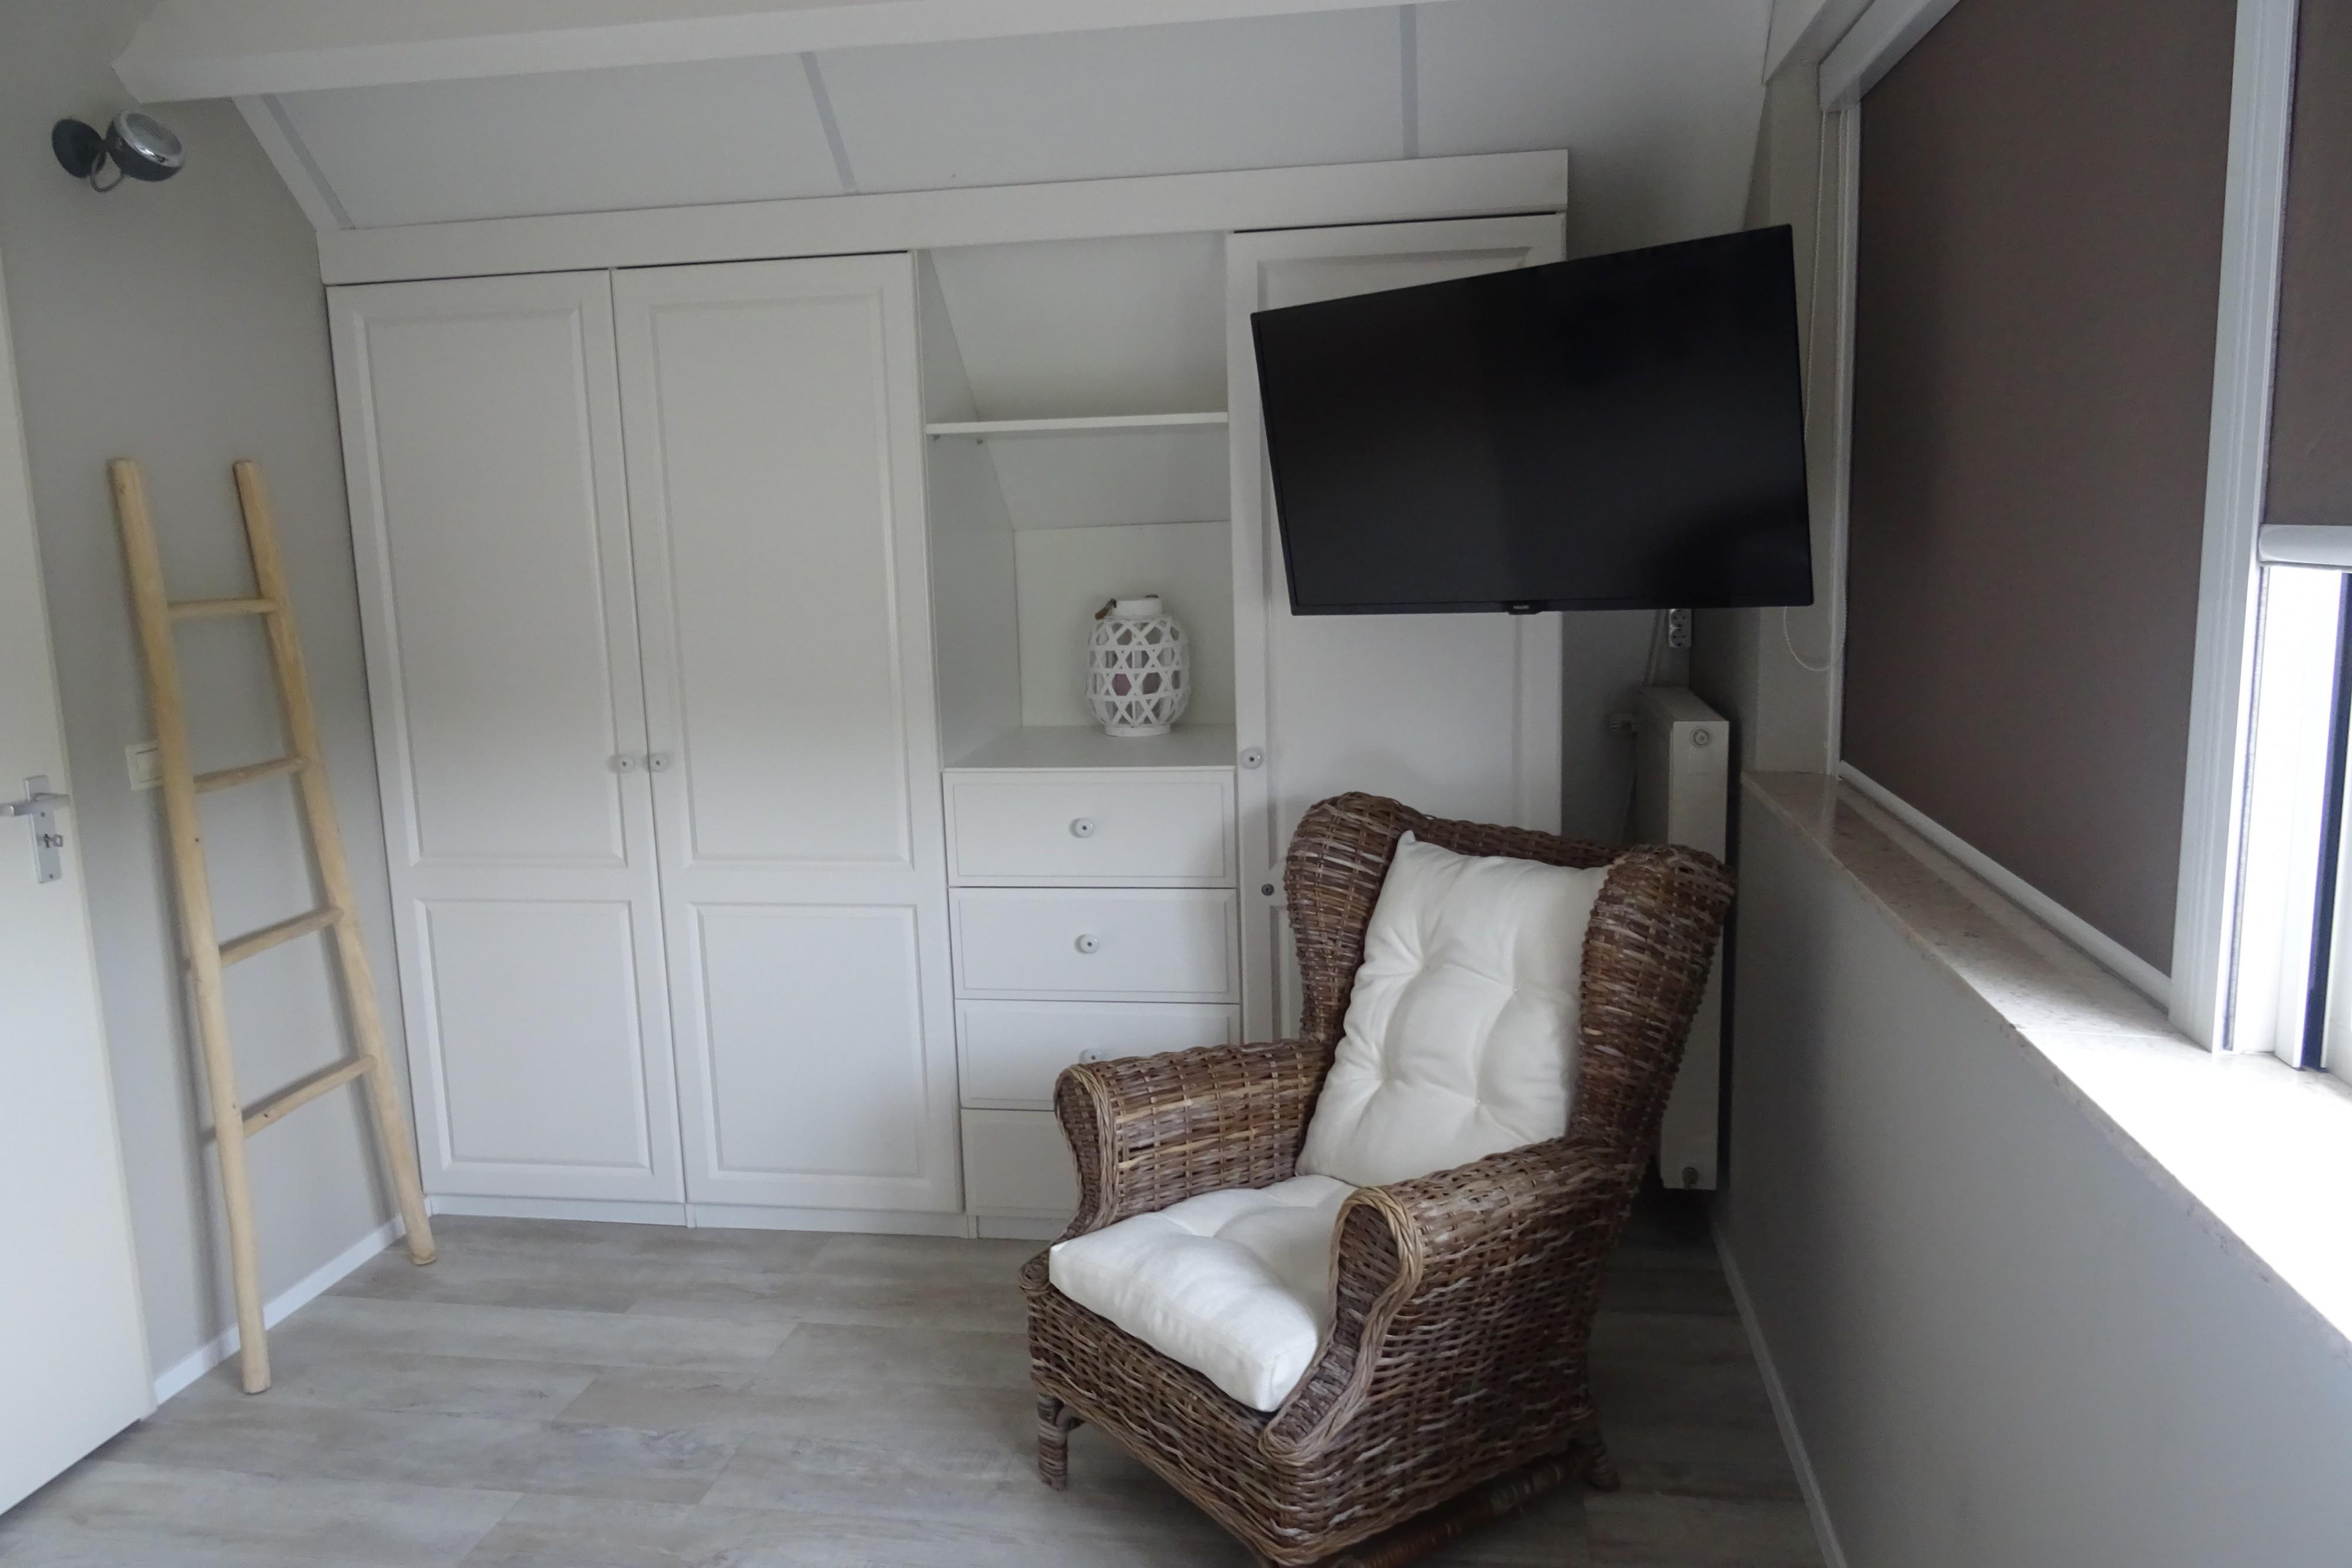 slaapkamer-1-met-stoel